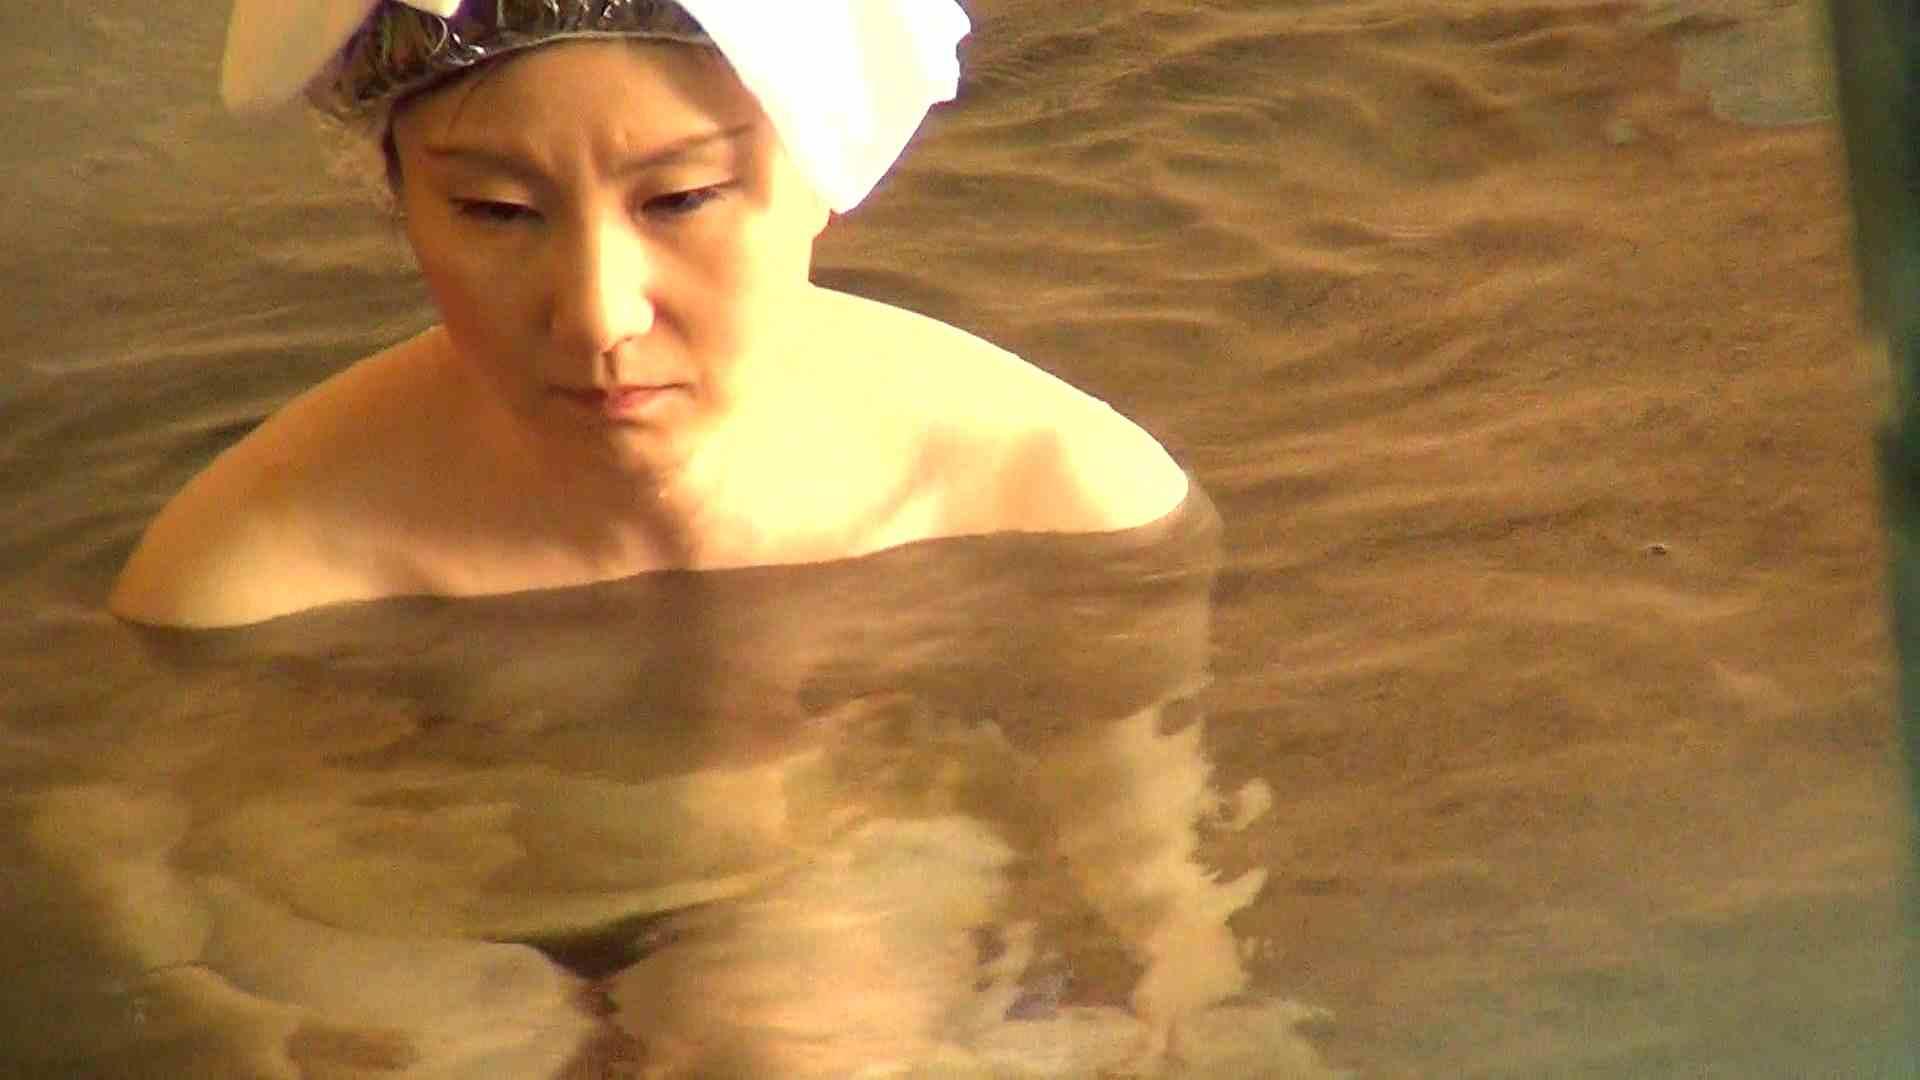 Aquaな露天風呂Vol.278 盗撮大放出 戯れ無修正画像 88連発 43